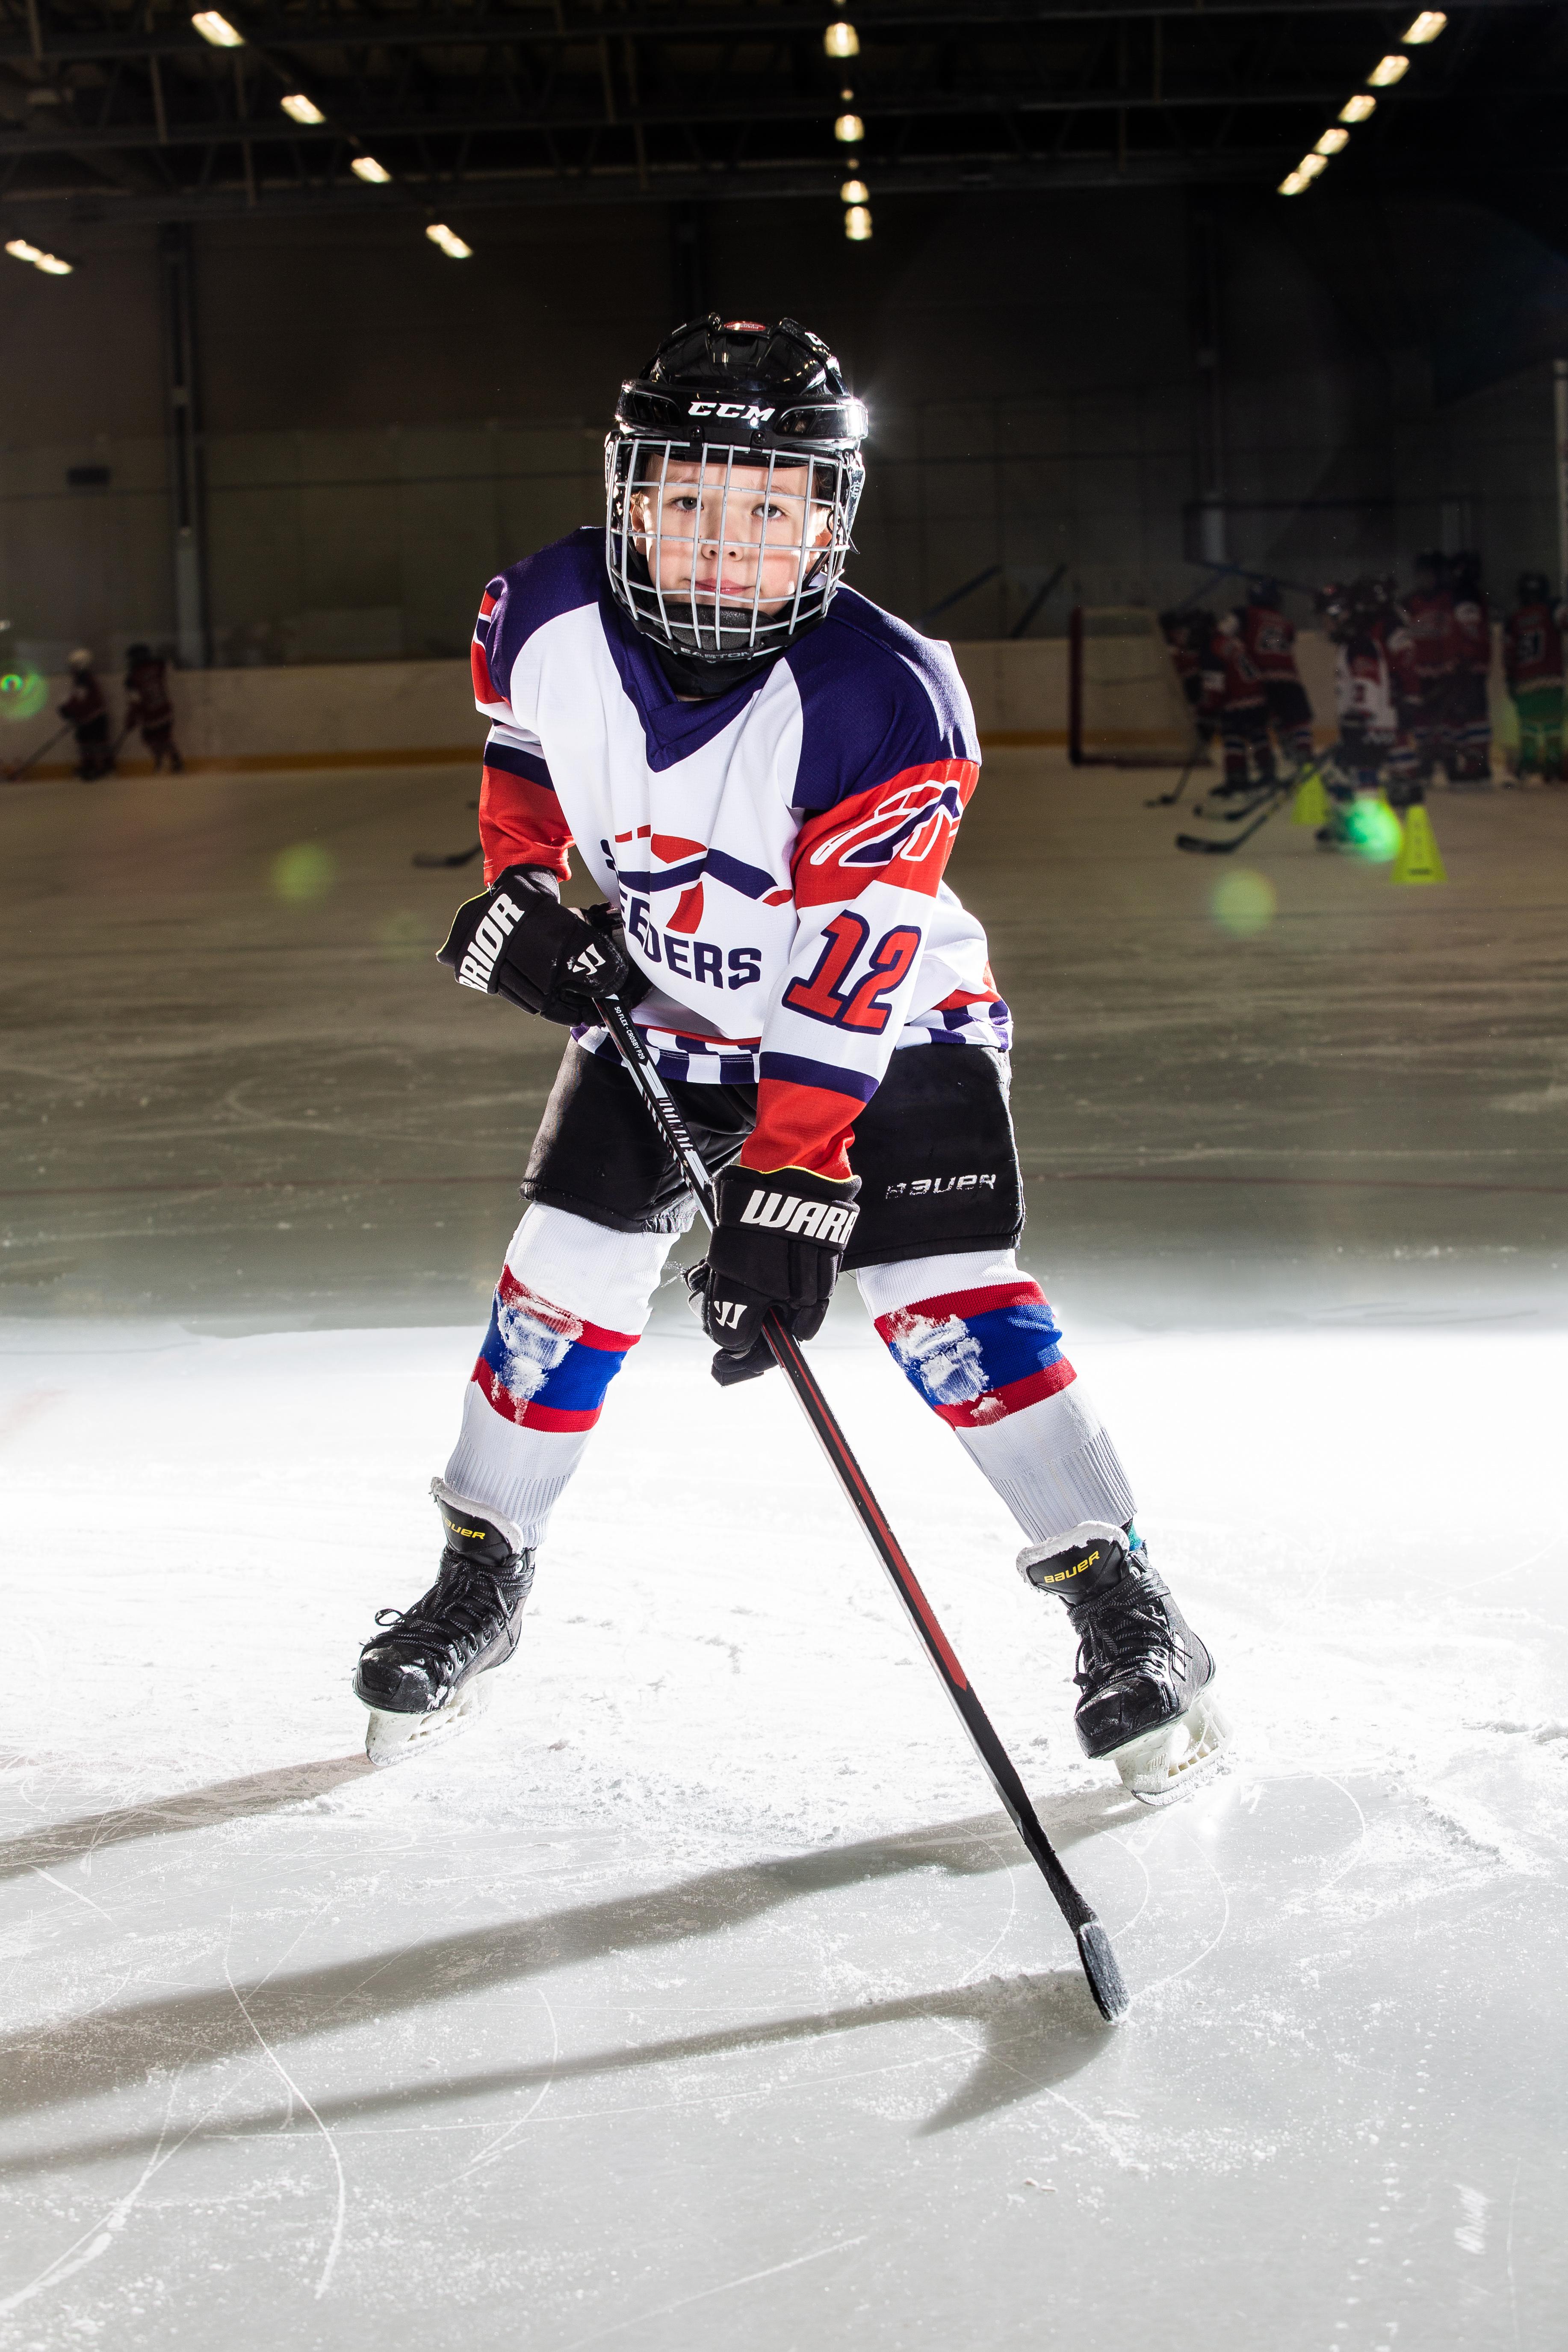 Adam Dobias Speeders Bratislava cislo 12 hokej